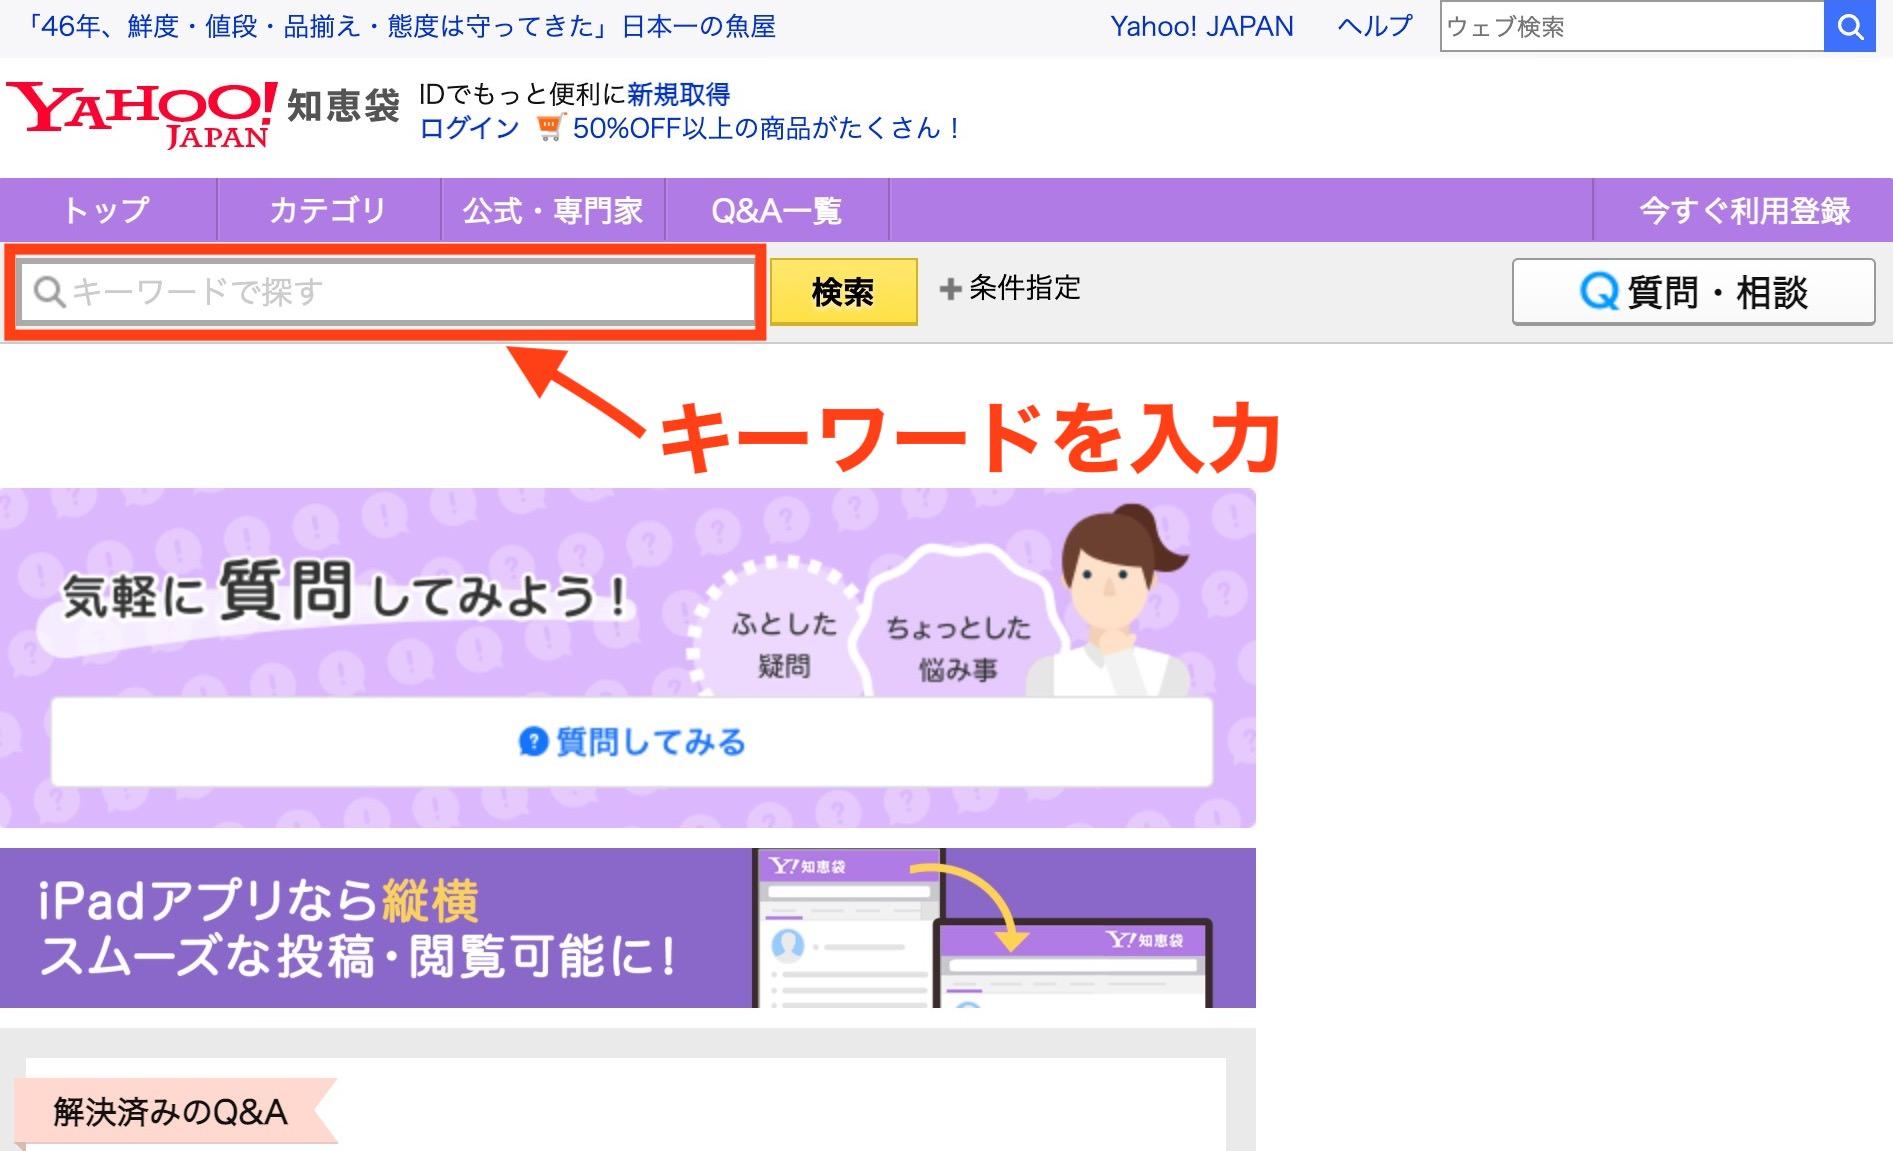 Yahoo!知恵袋TOPページ